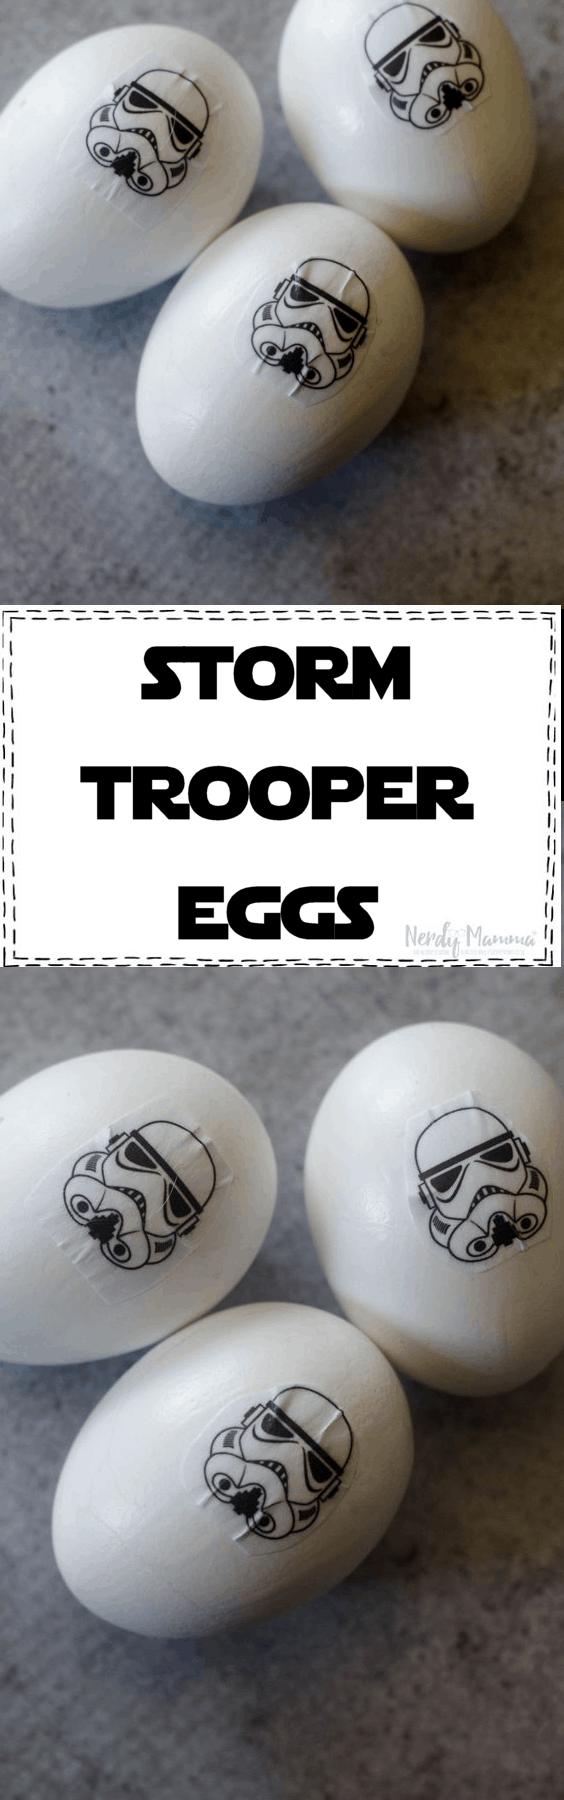 Storm Trooper Eggs